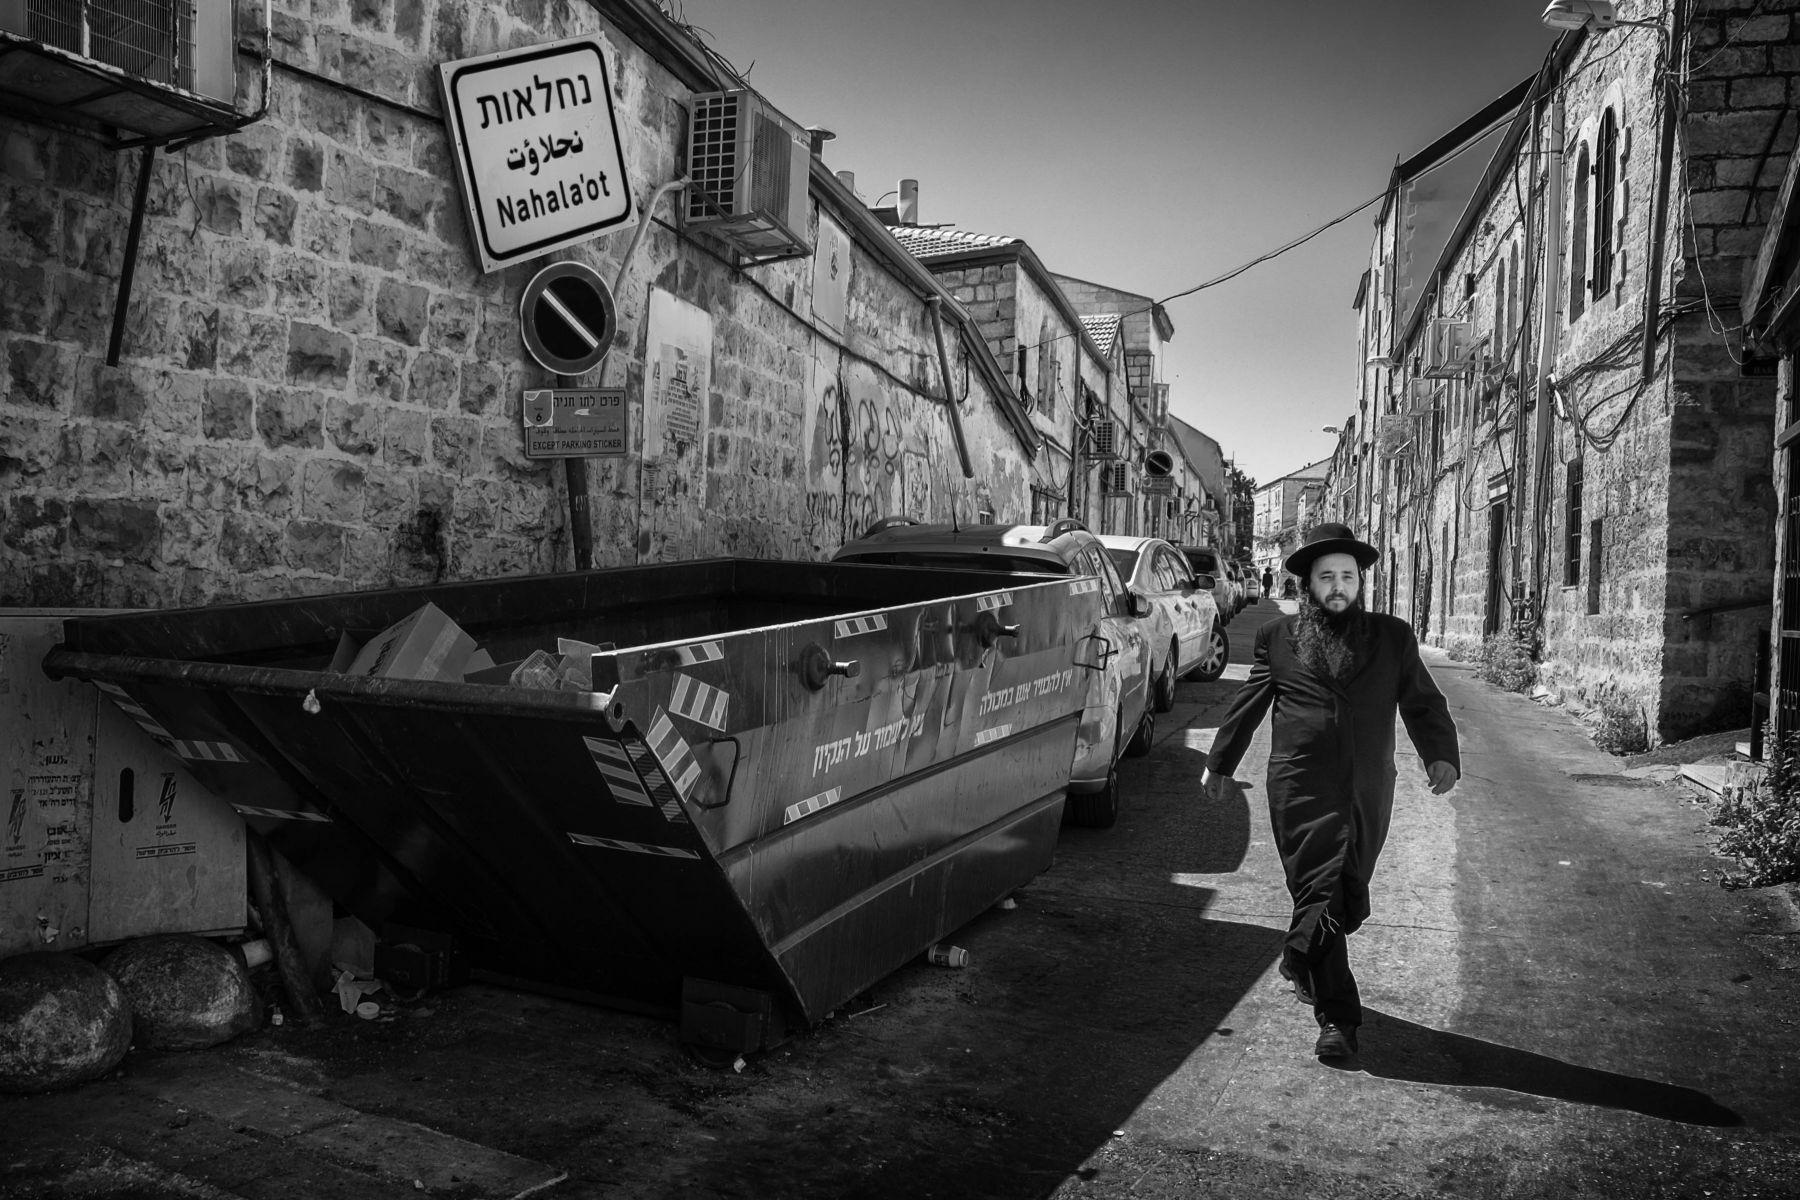 Jerusalem, Israel 04/26/15